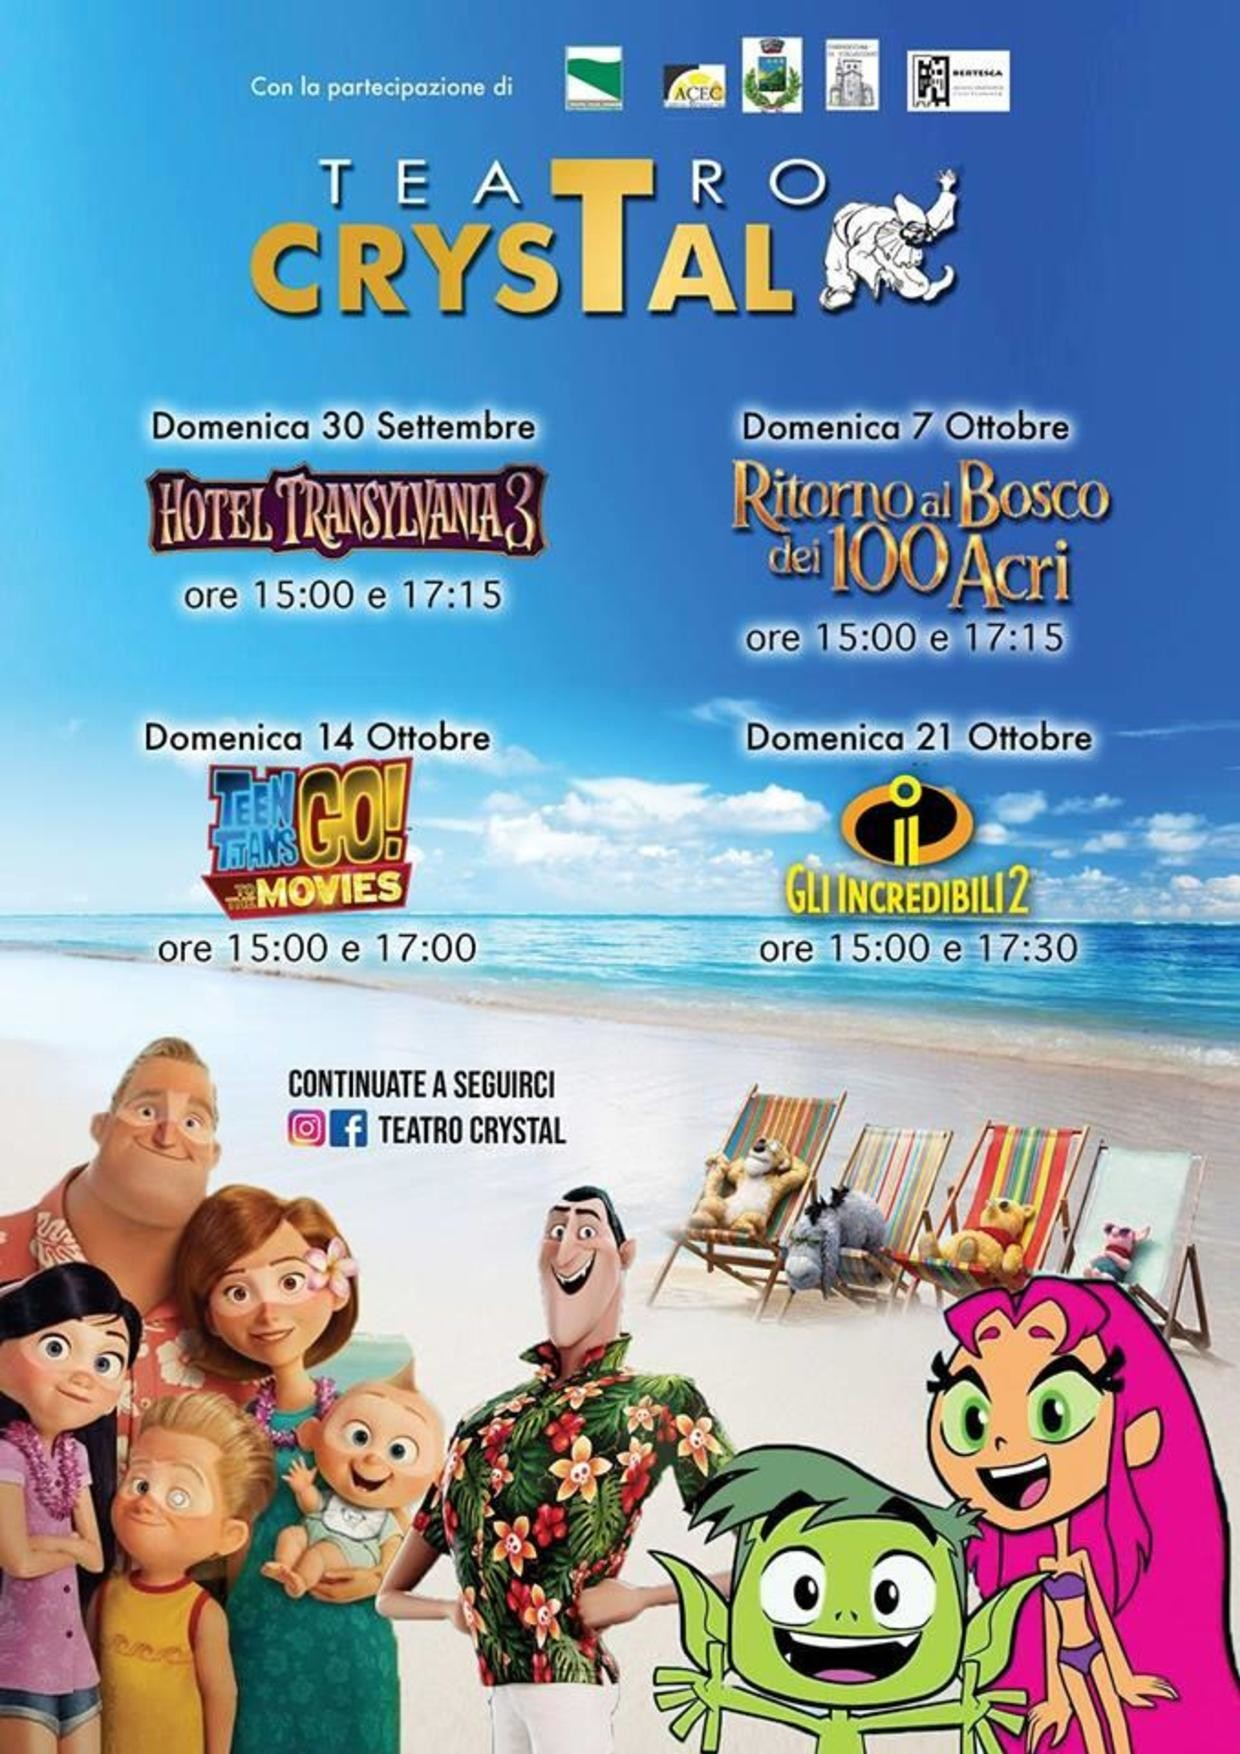 Cinema al Crystal: al via la nuova stagione